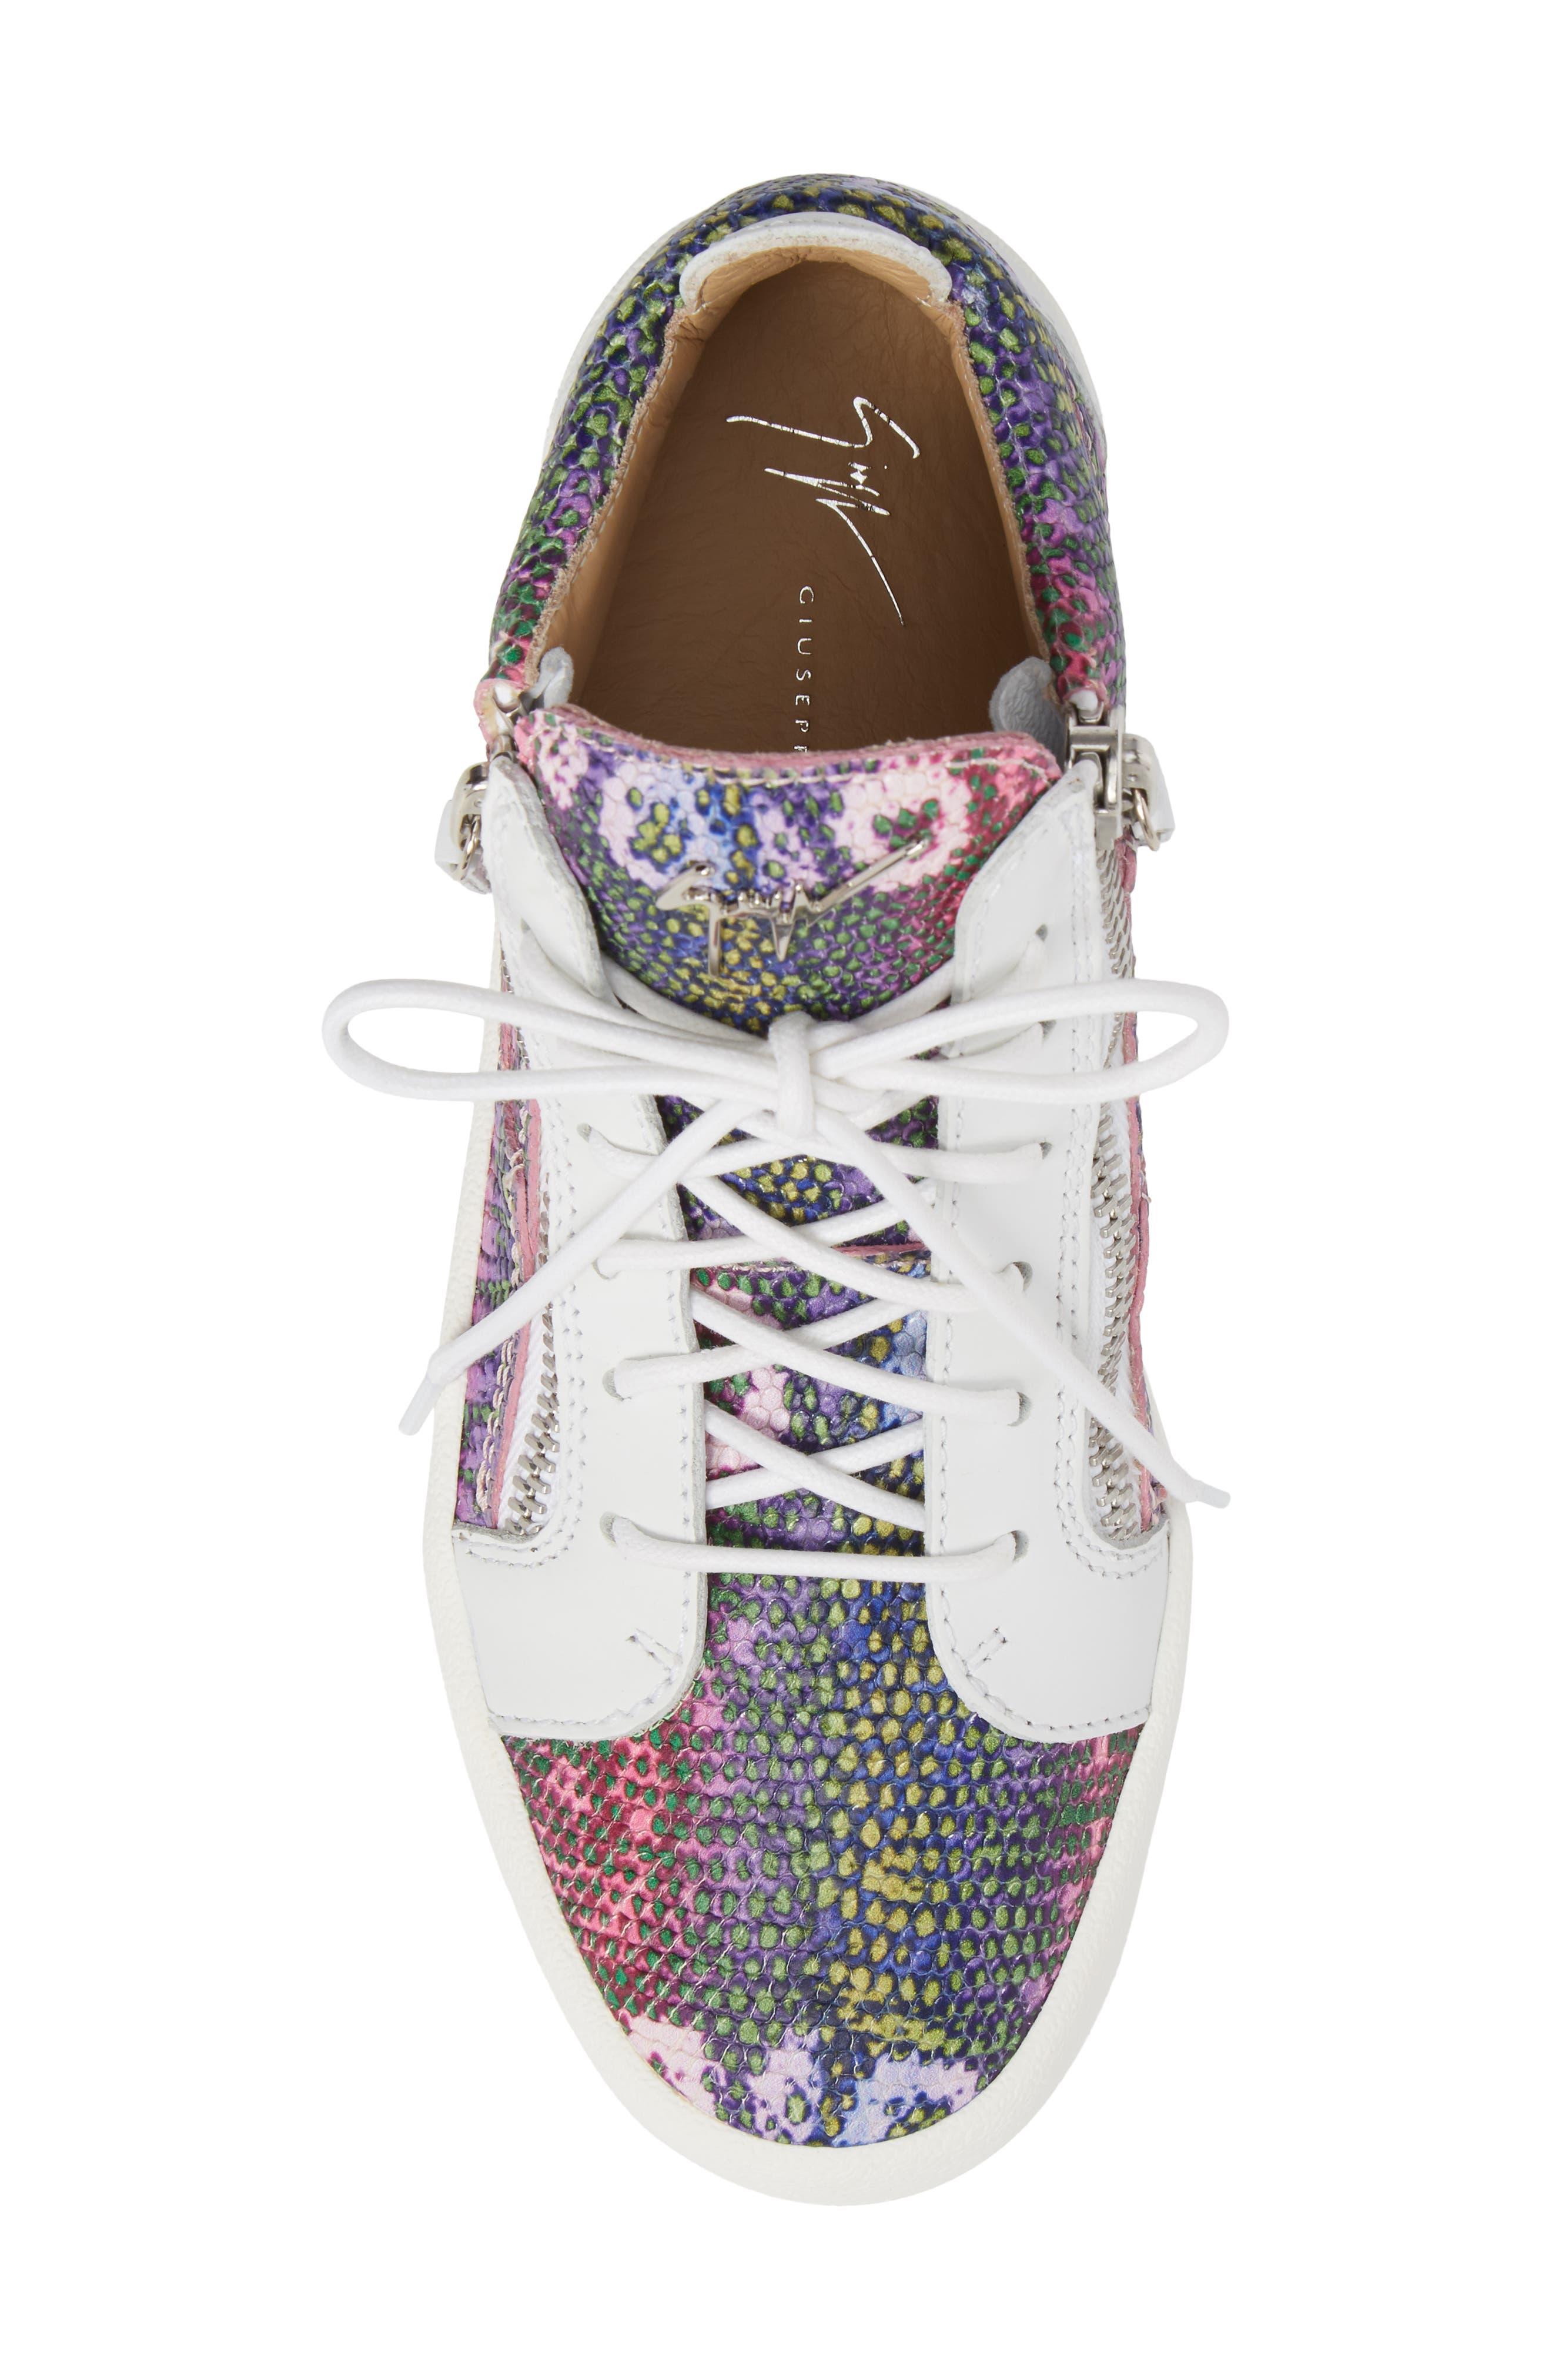 May London Mid Top Sneaker,                             Alternate thumbnail 5, color,                             PINK MULTI